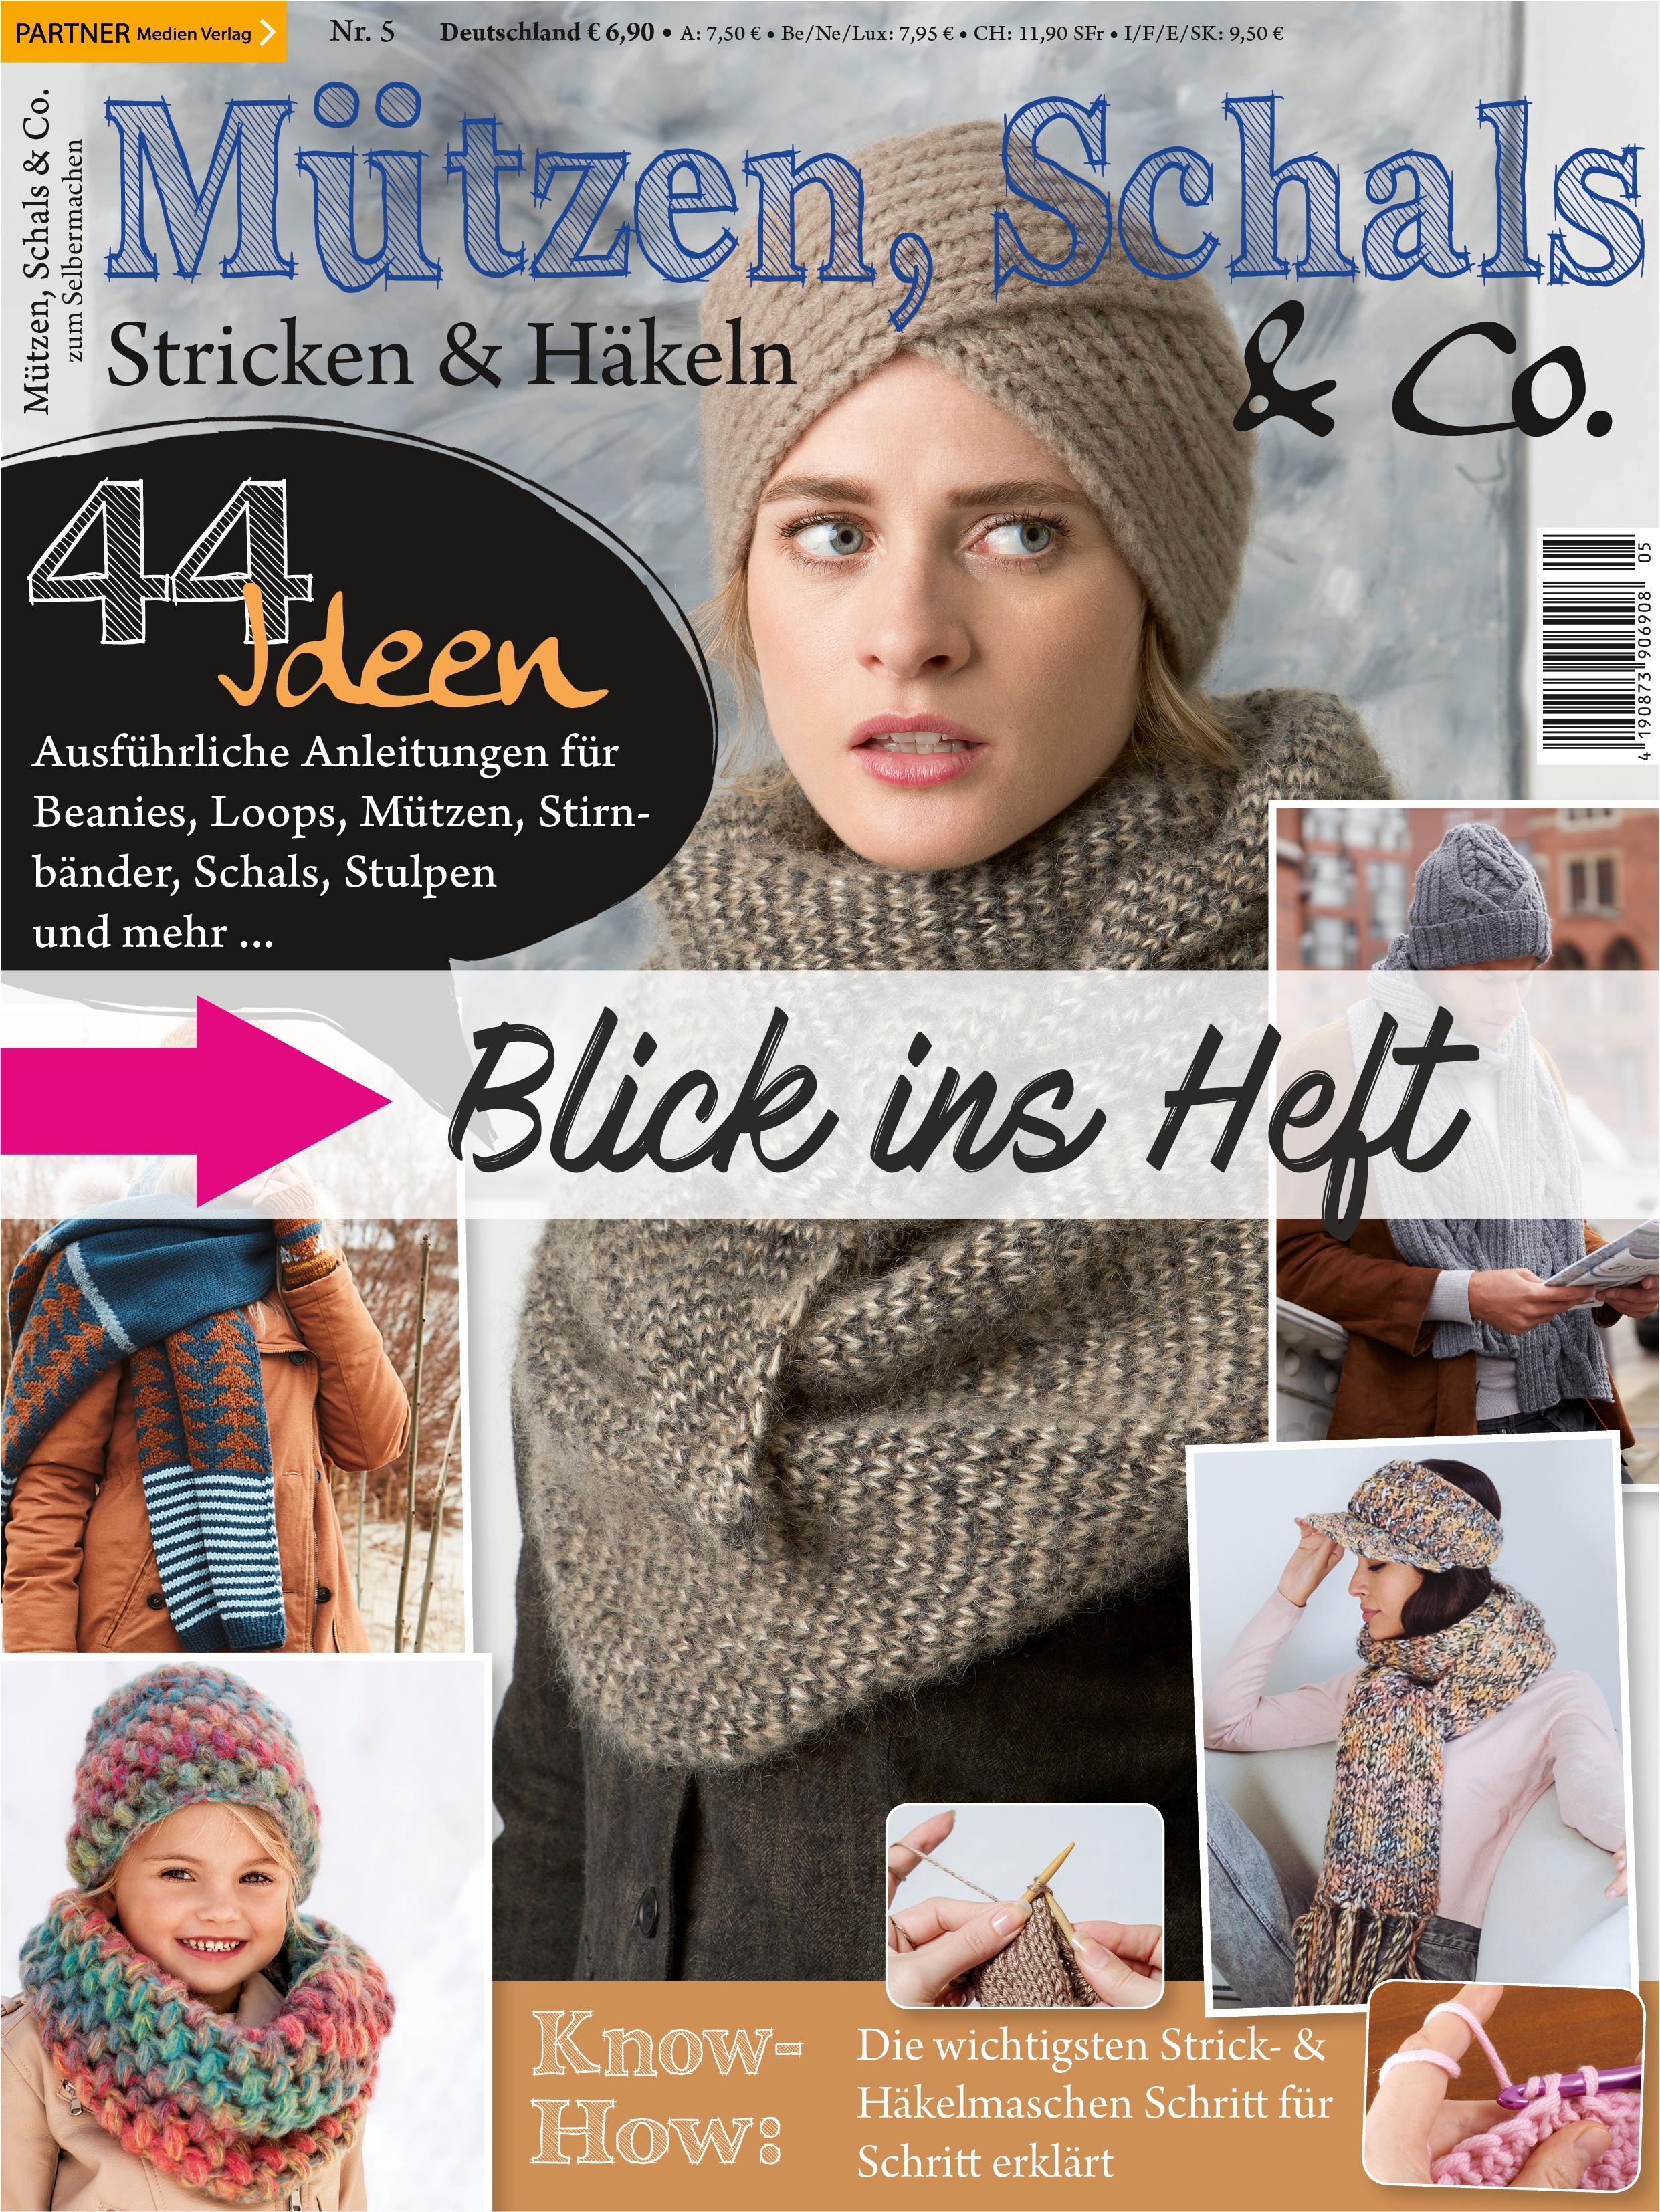 Heft Sonderheft Sk Design 7s Patchwork Wwwbilderbestecom